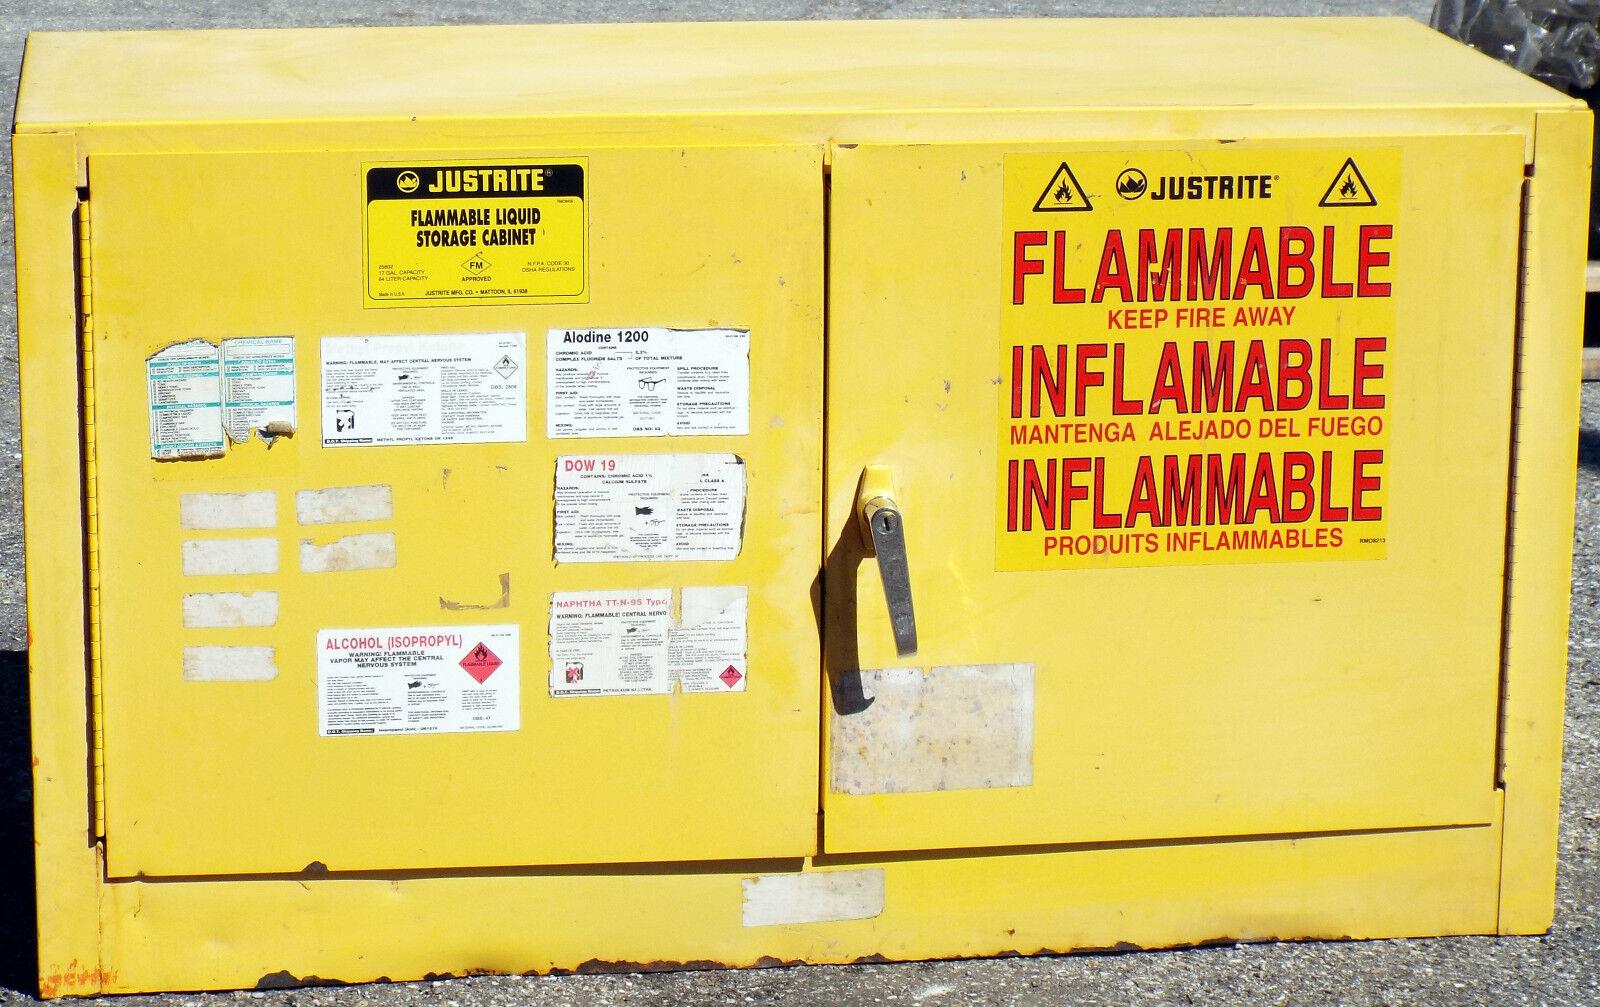 justrite 25802 industrial flammable 17-gallon liquid storage